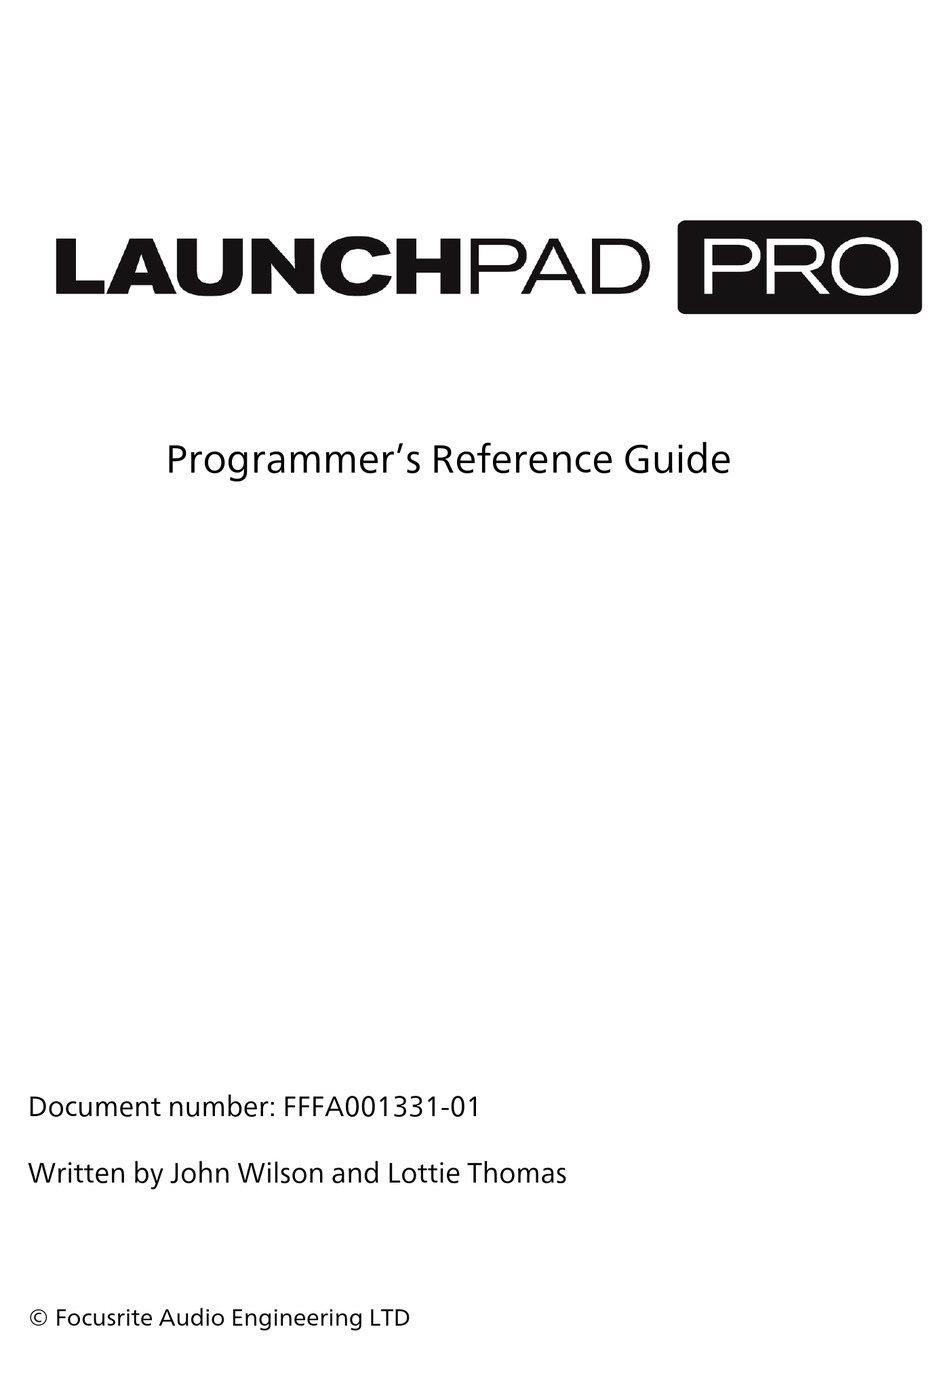 Launchpad novation app pc